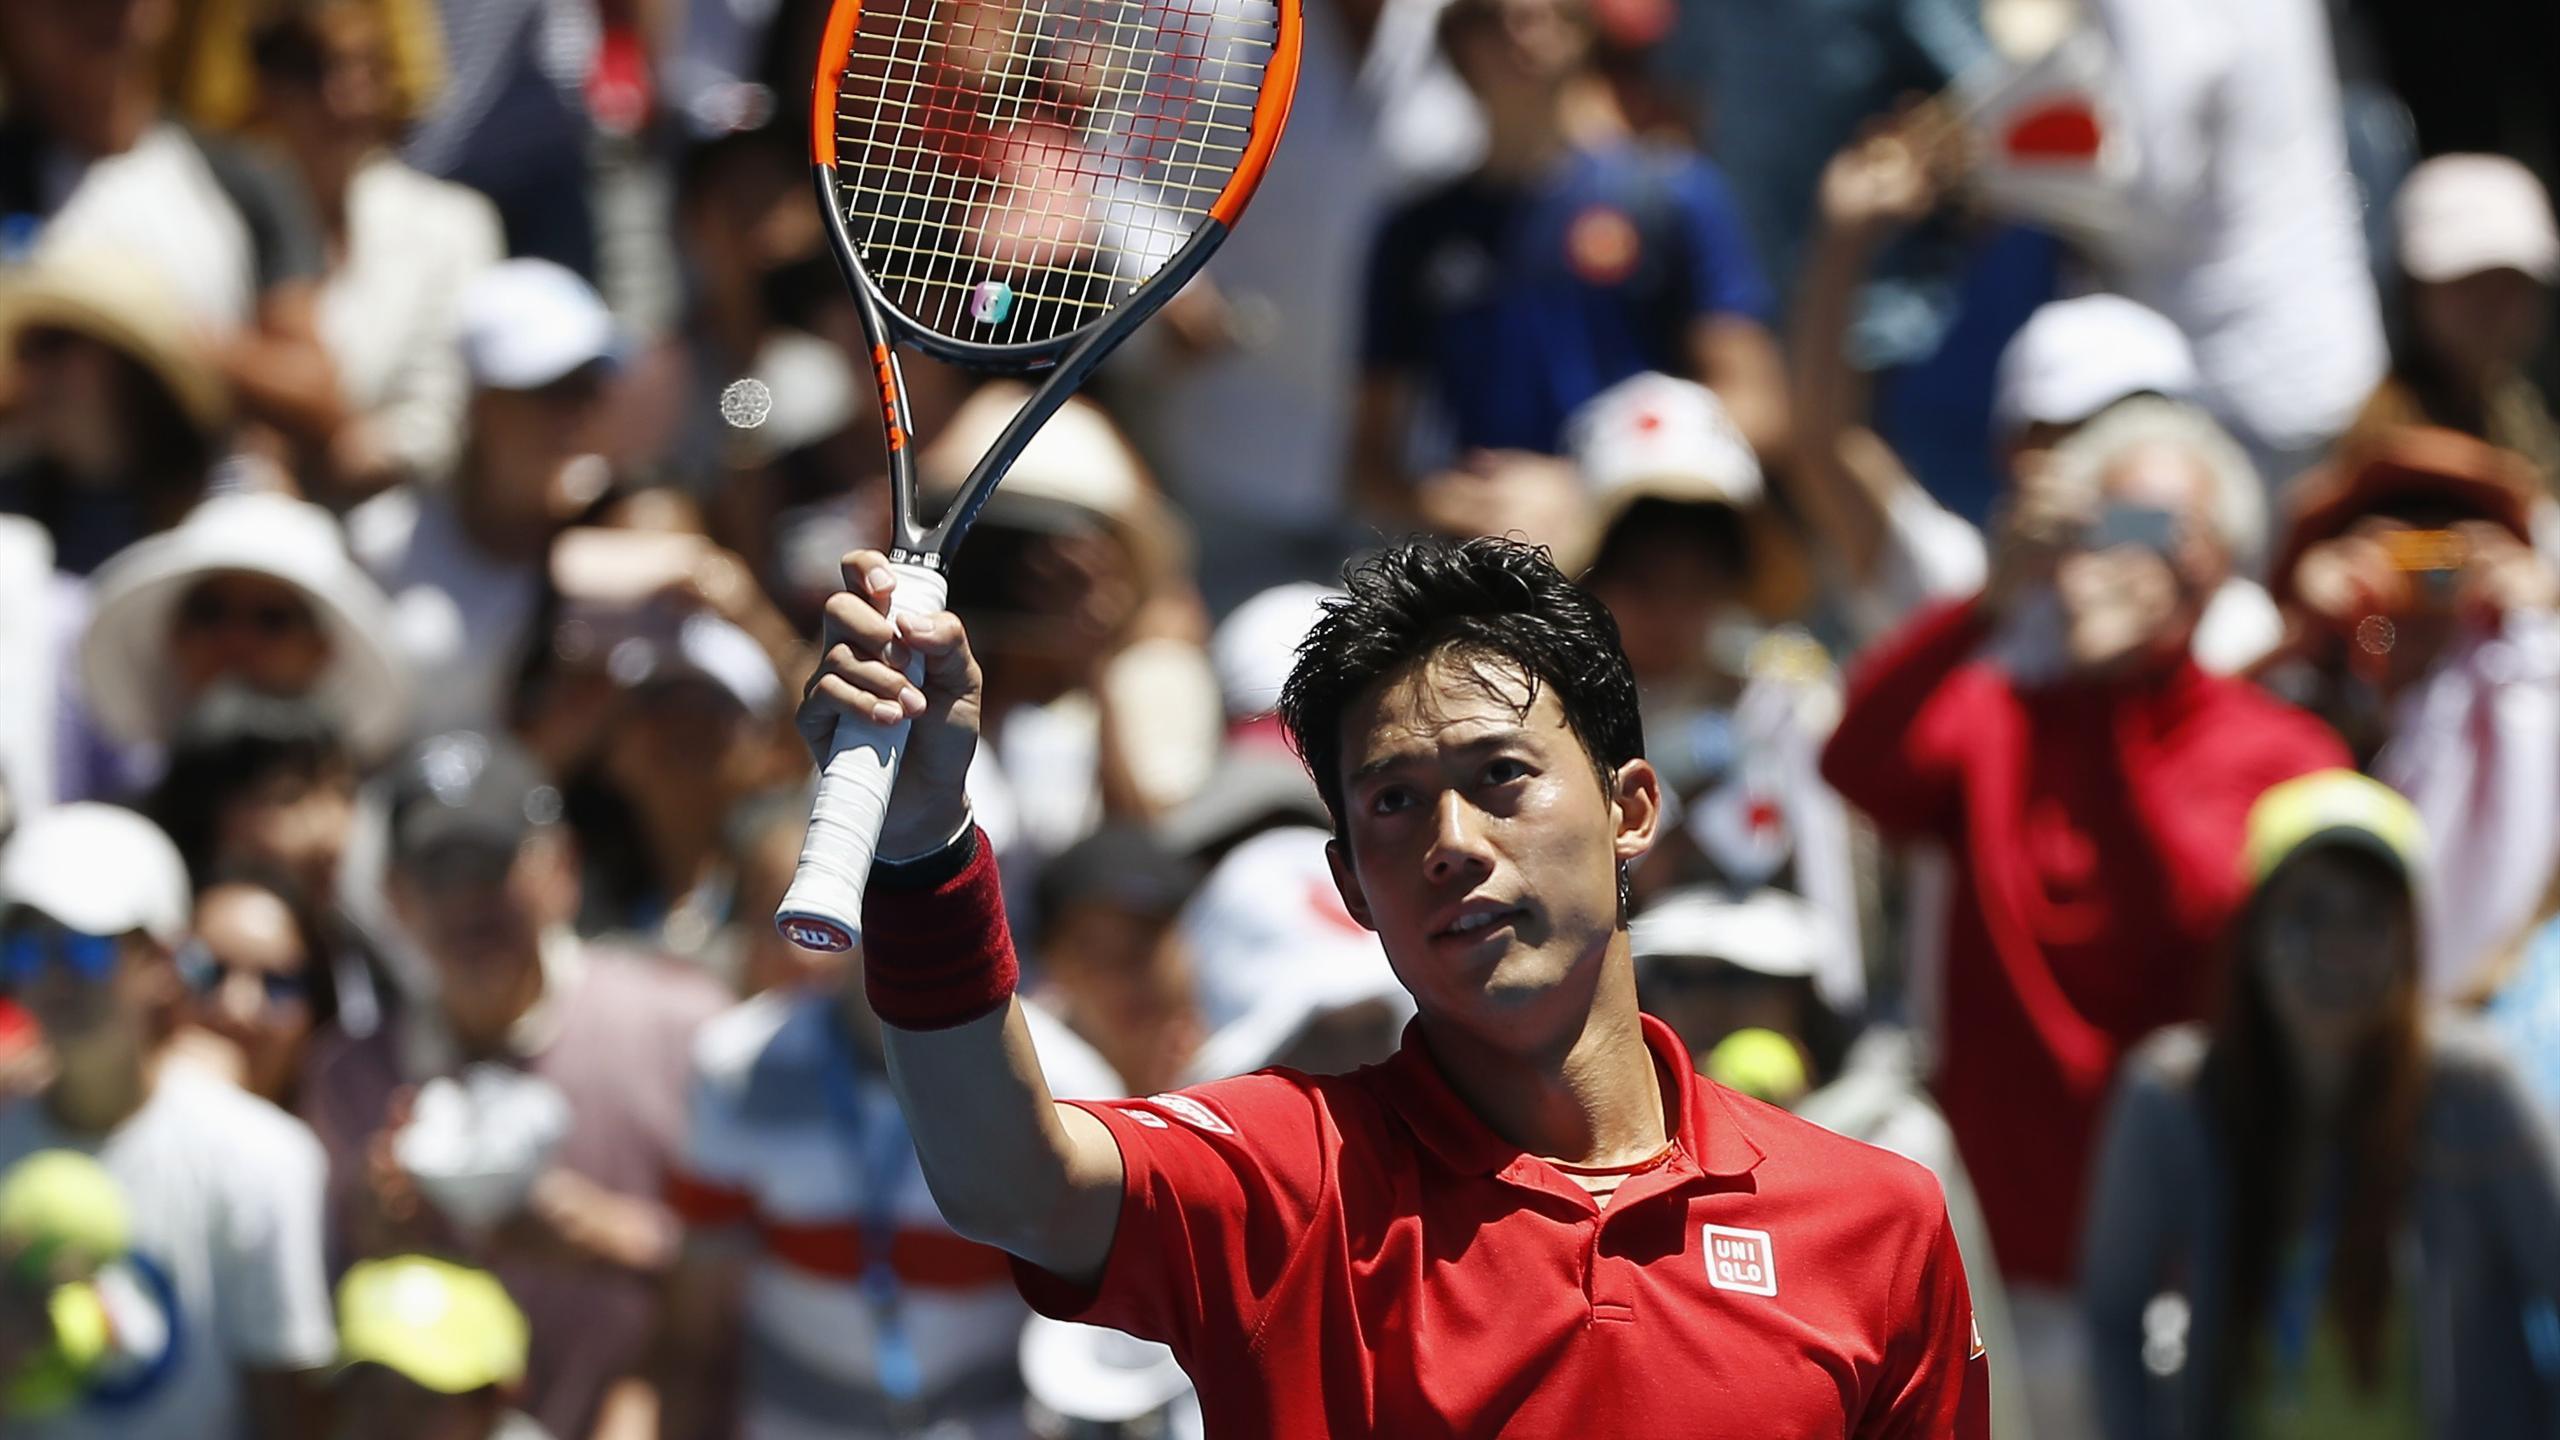 Japan's Kei Nishikori celebrates after winning his Men's singles second round match against France's Jeremy Chardy